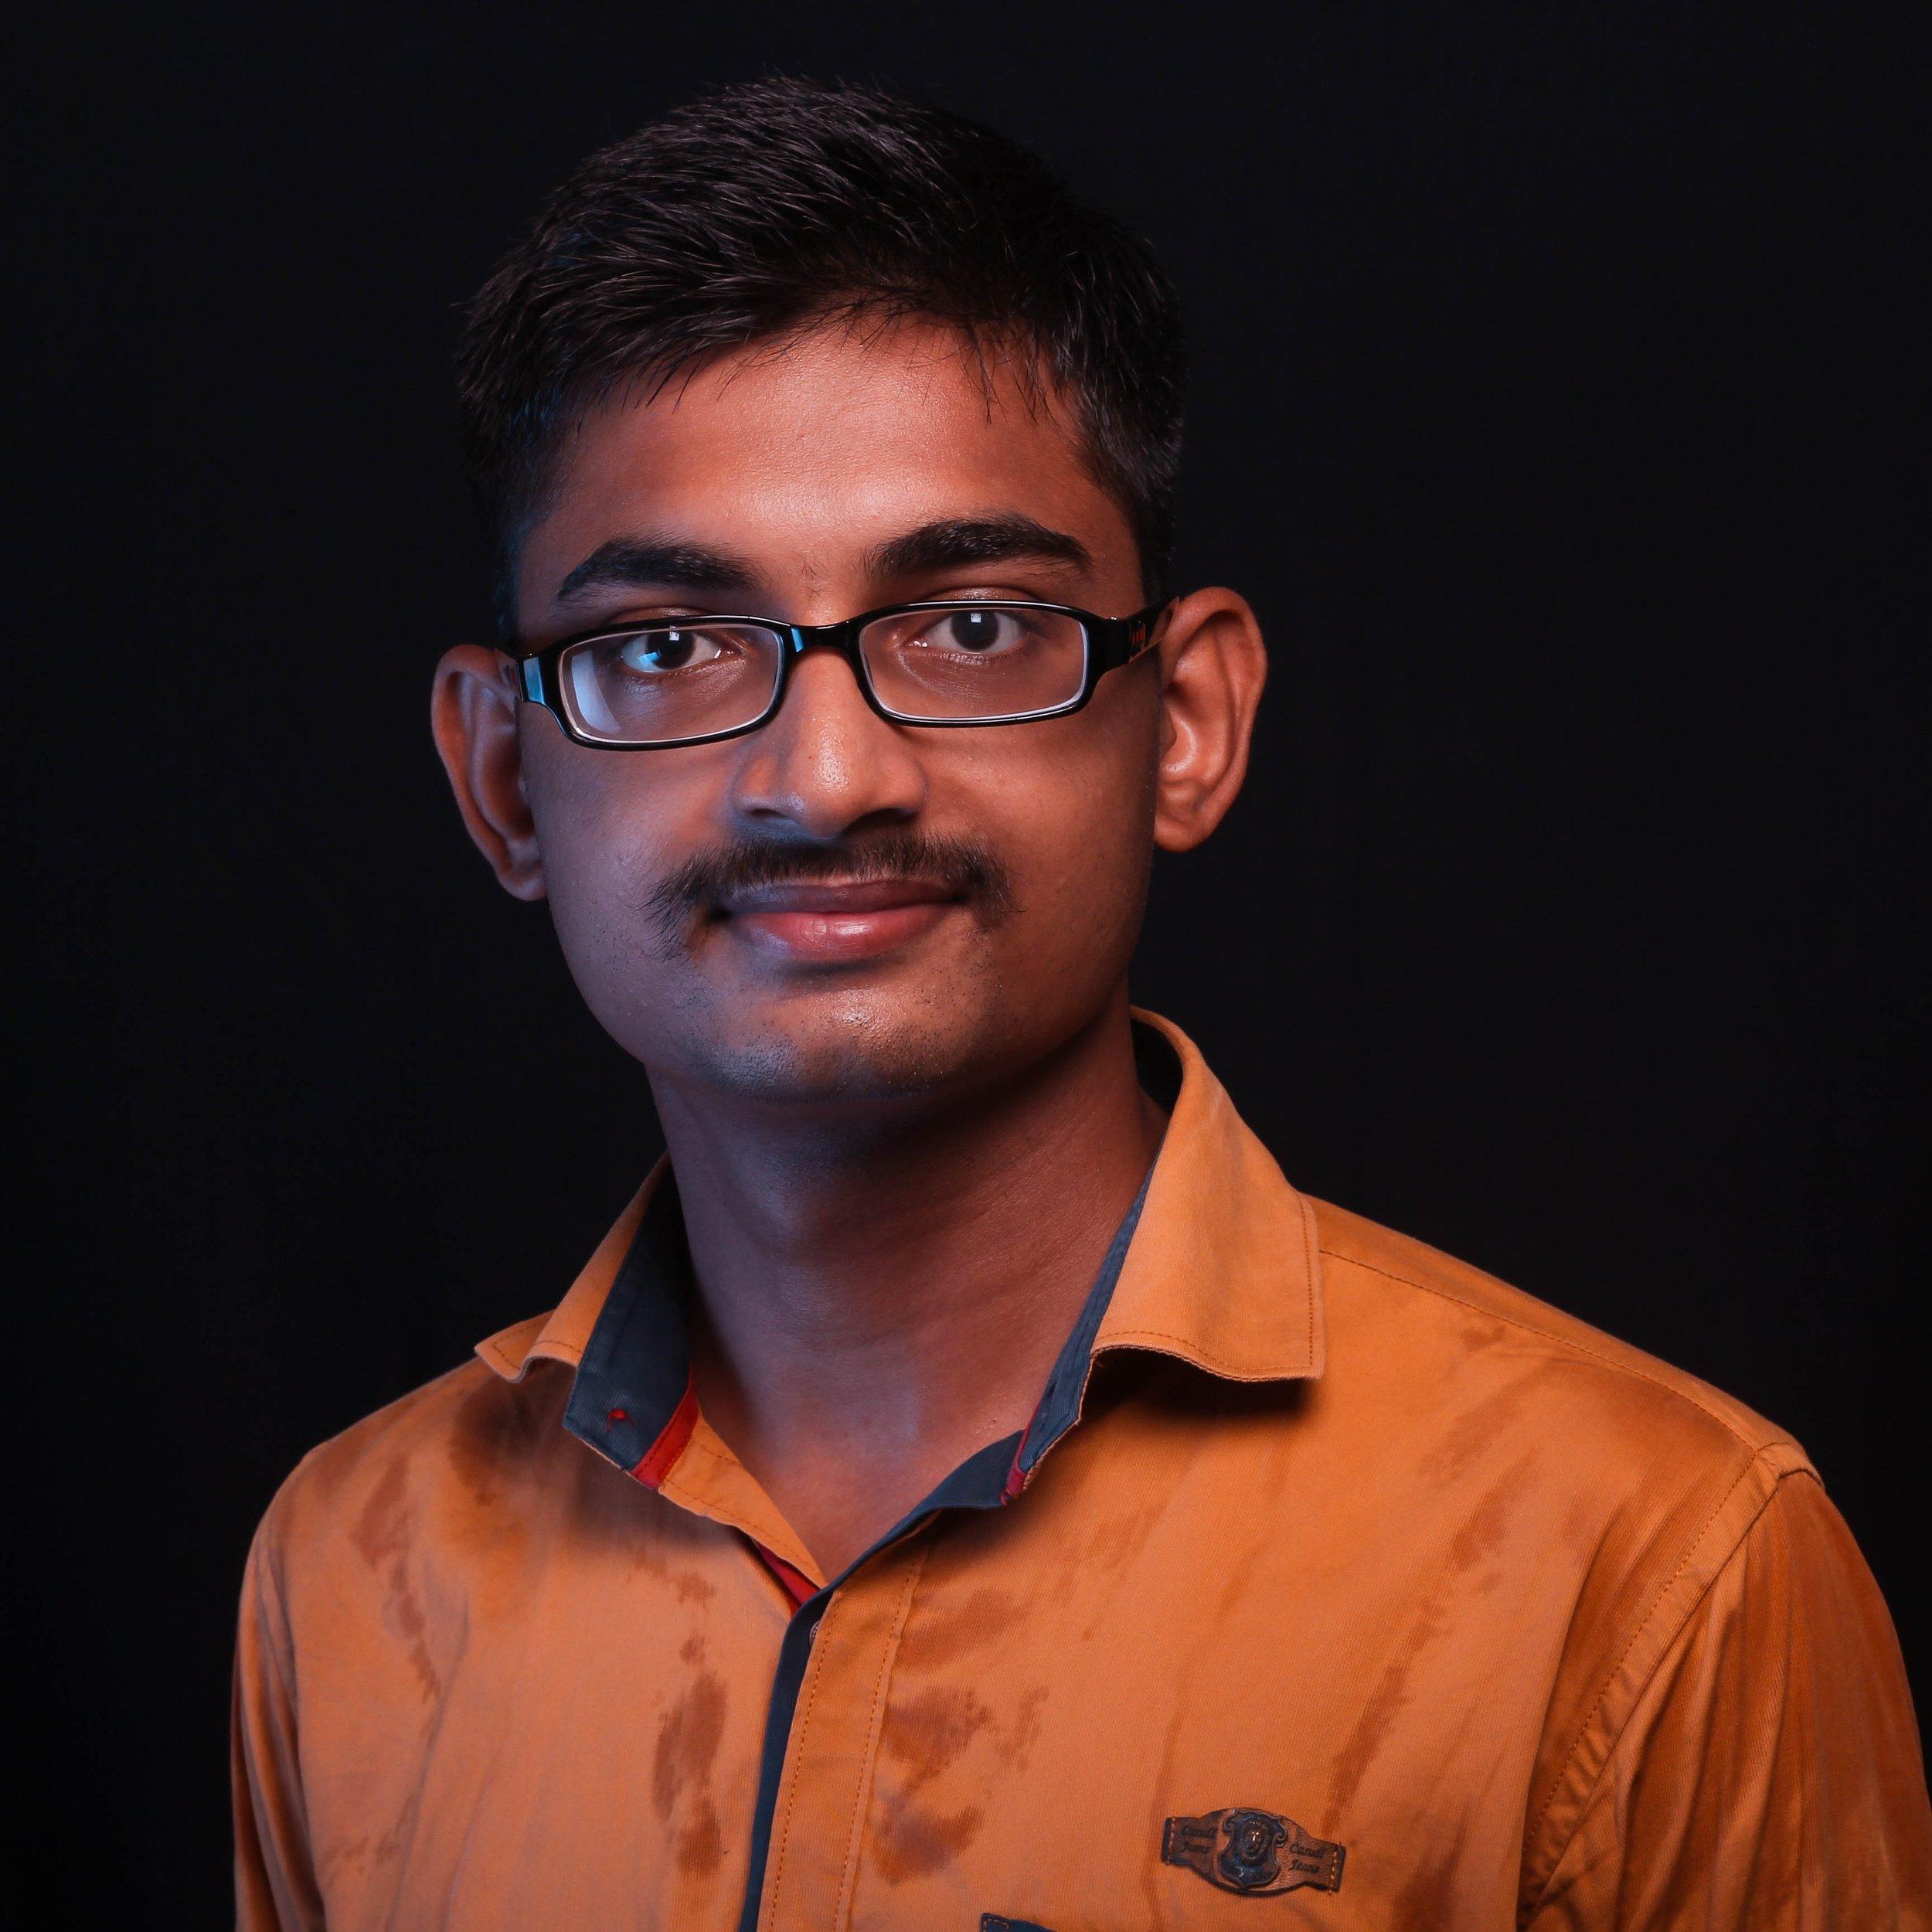 Shubham Gupta, NIT Trichy